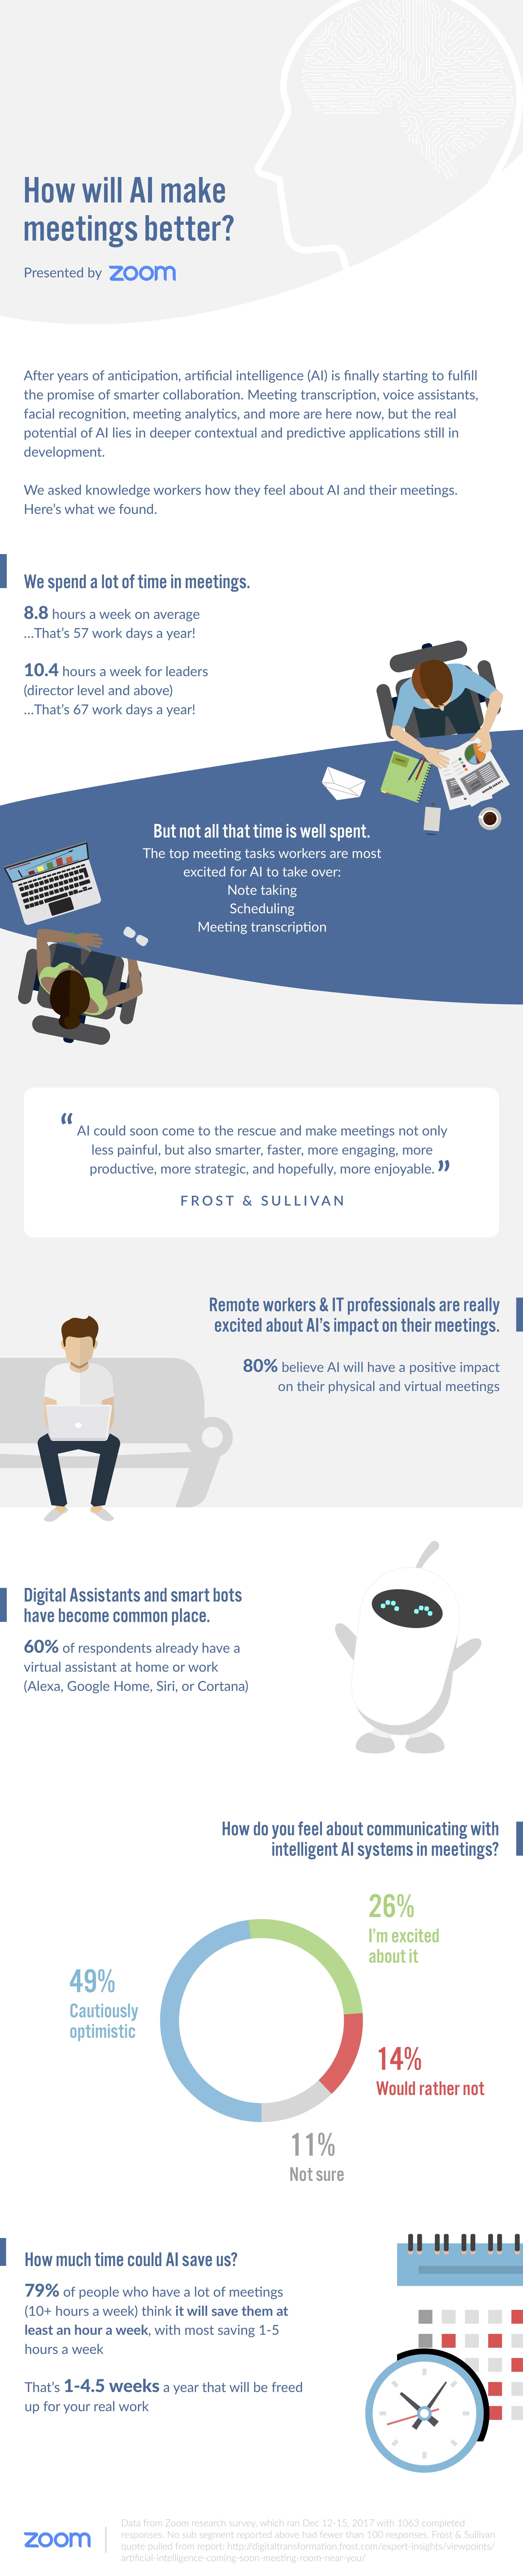 AI Meetings Infographic Image